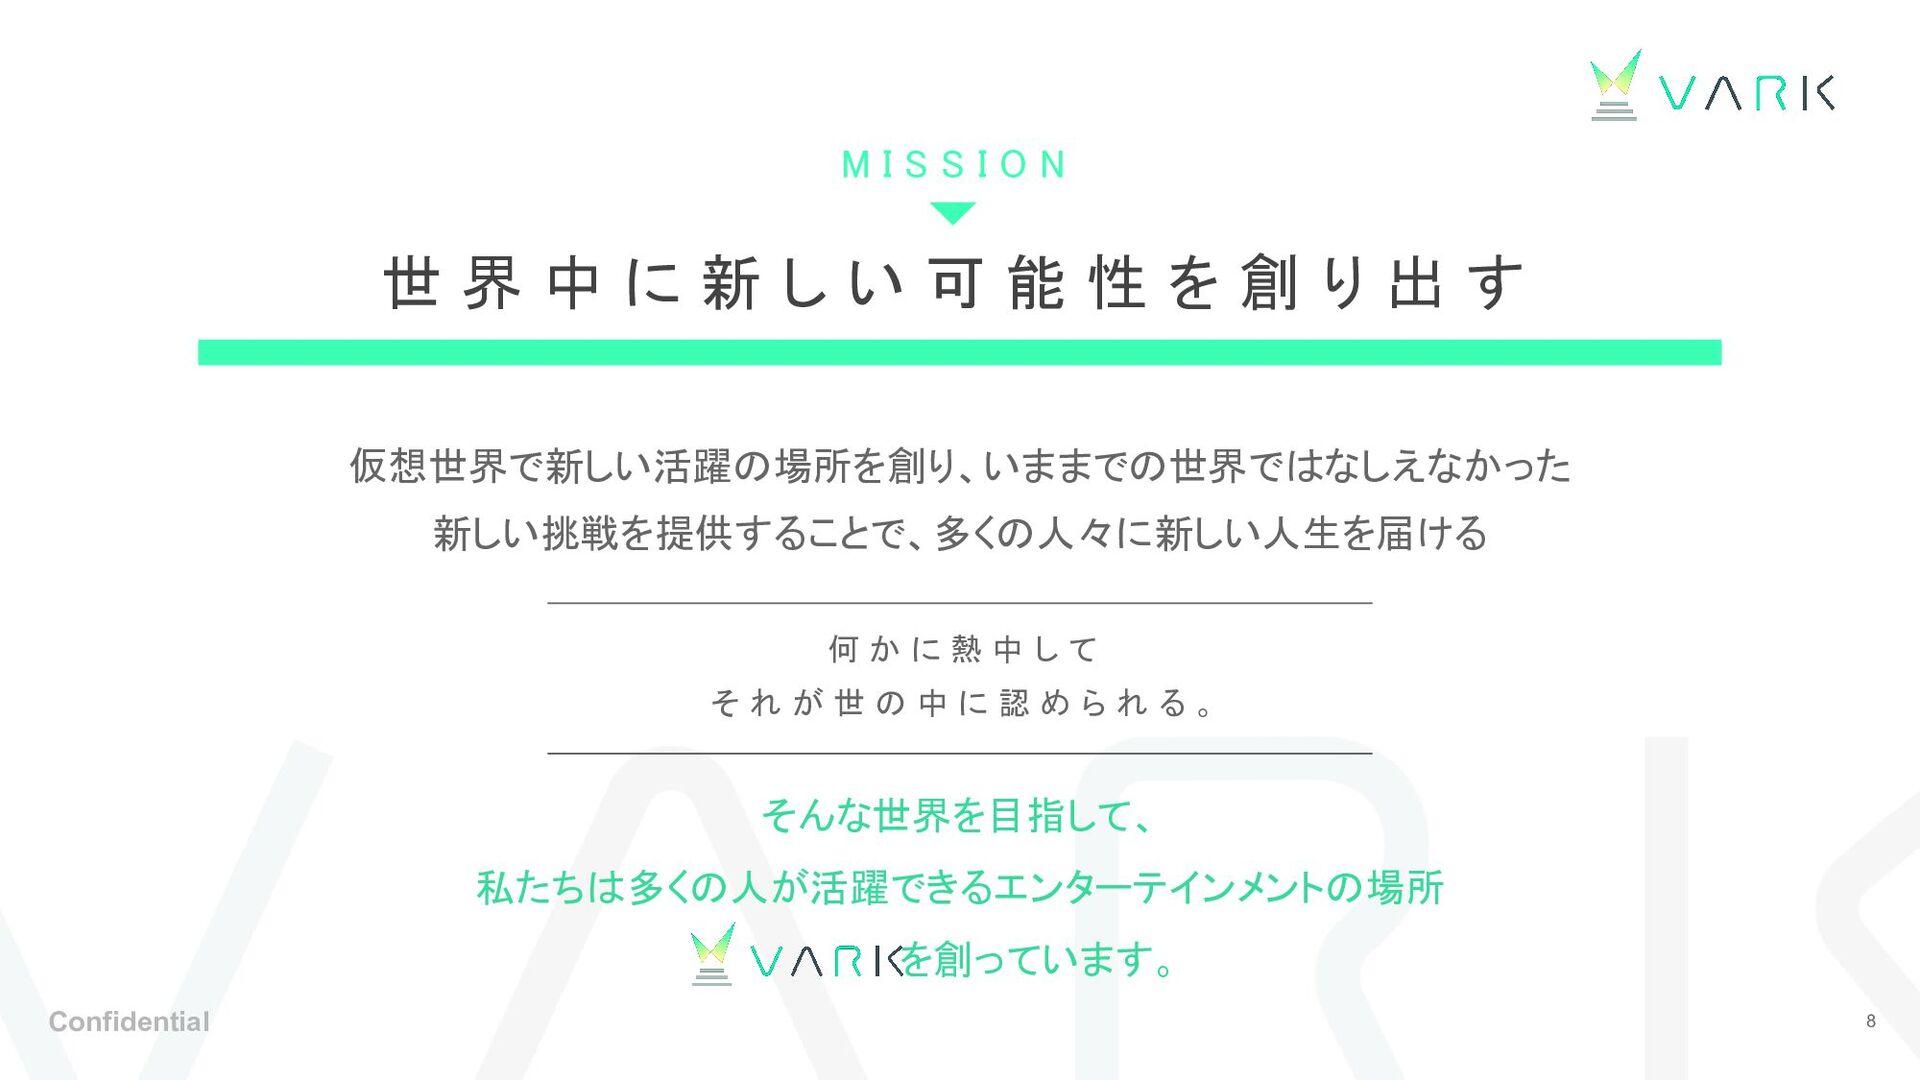 VARK のミッション 「 新 し い 活 躍 の 場 所 を 創 り 、 新 し い 人 生...